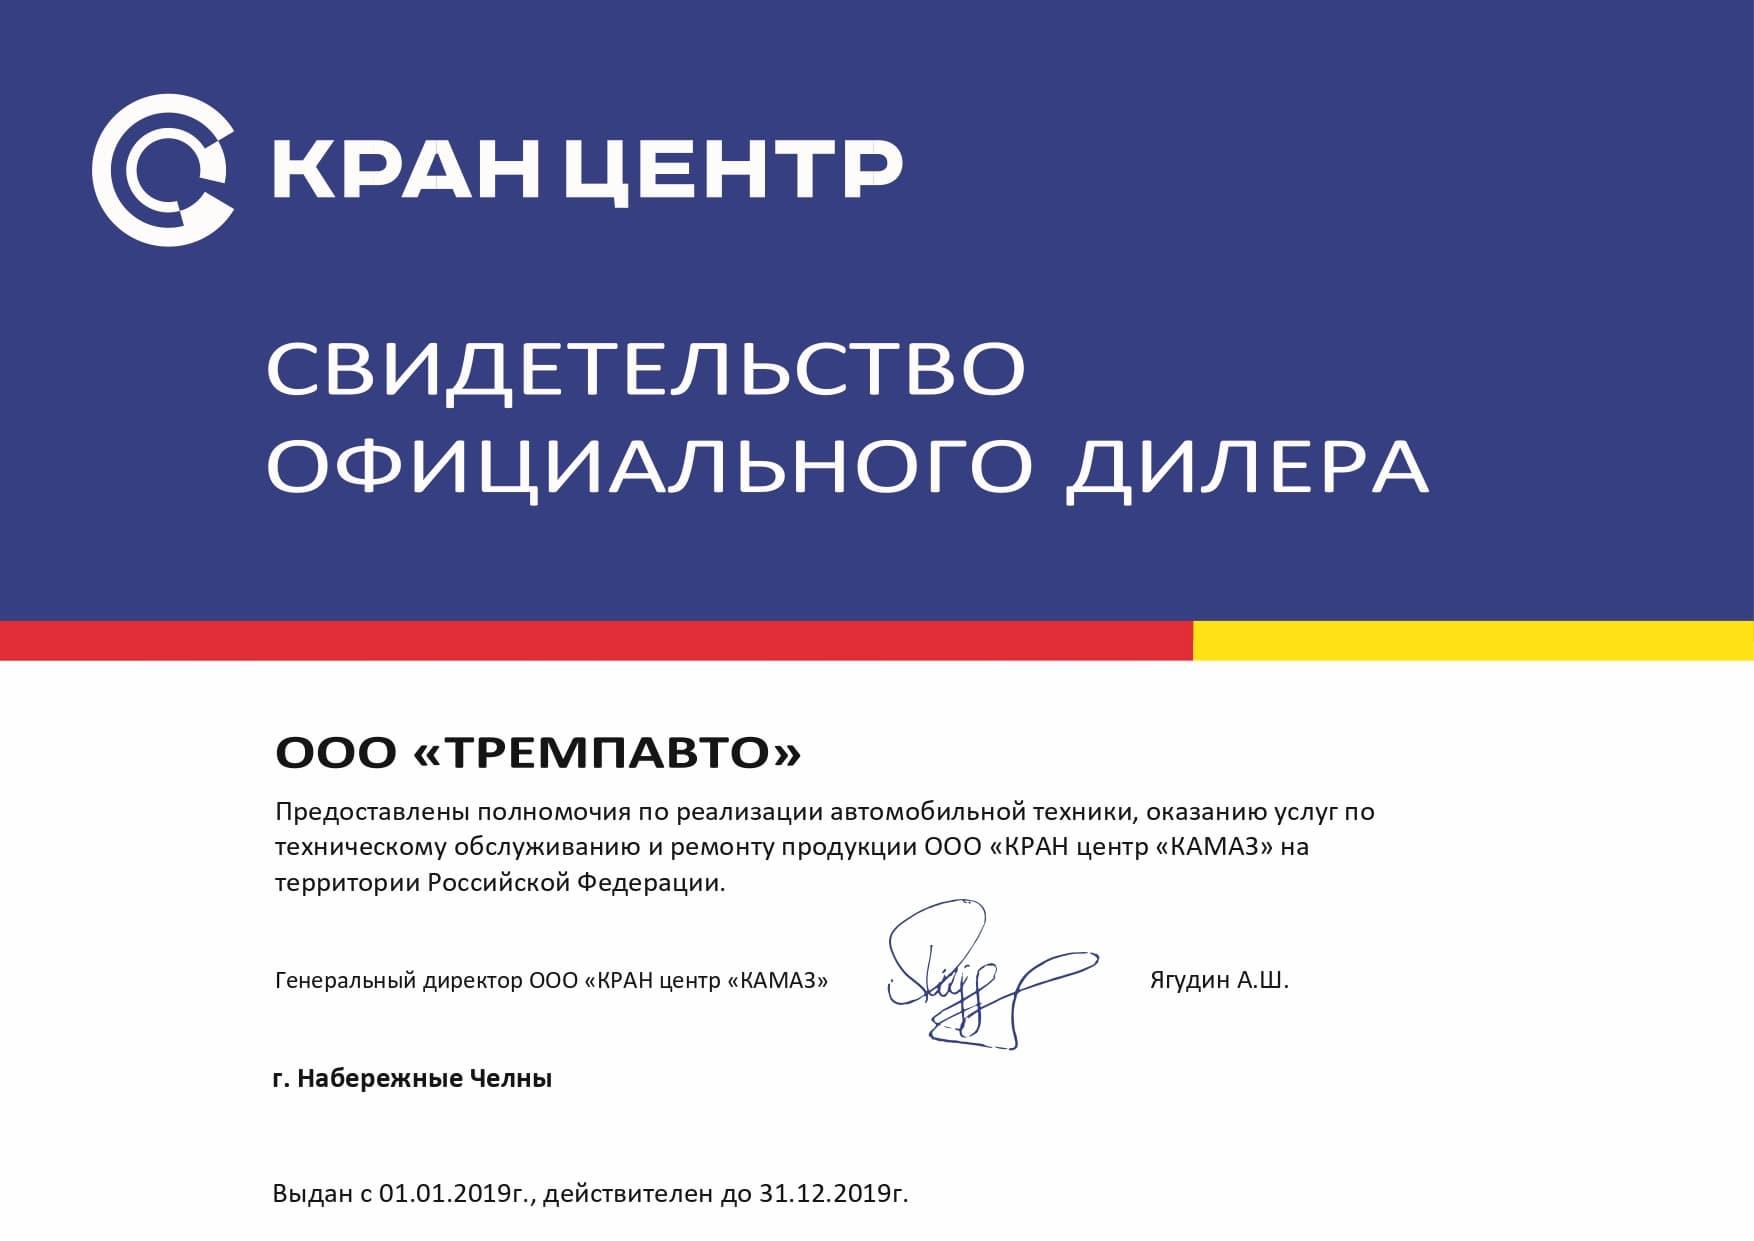 Сертификат КРАН центр КАМАЗ 2019